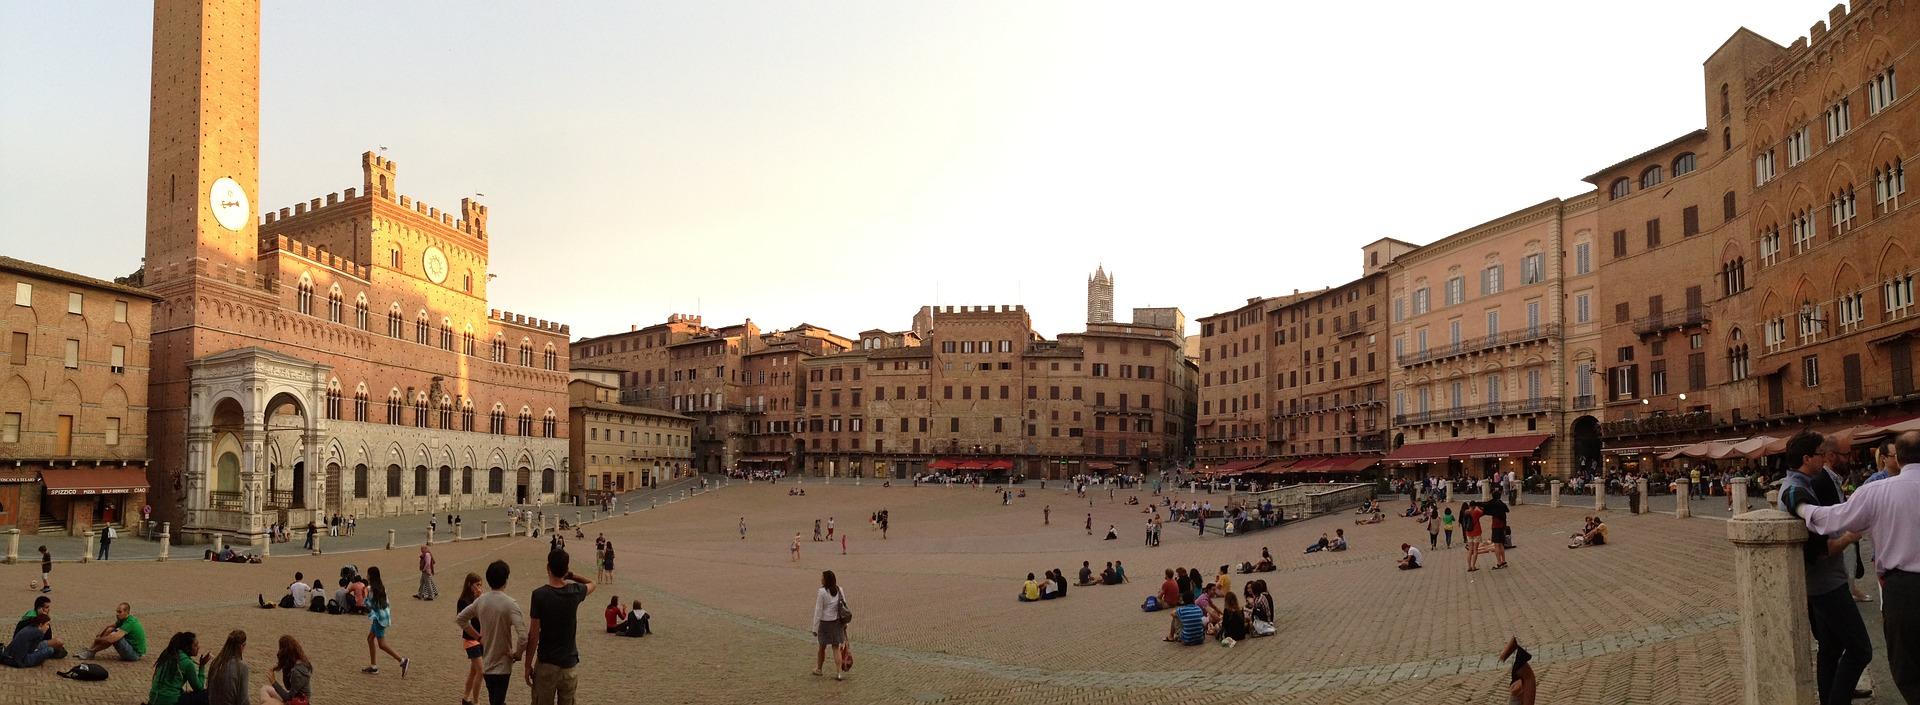 Piazza del Campo Siena - vista della piazza